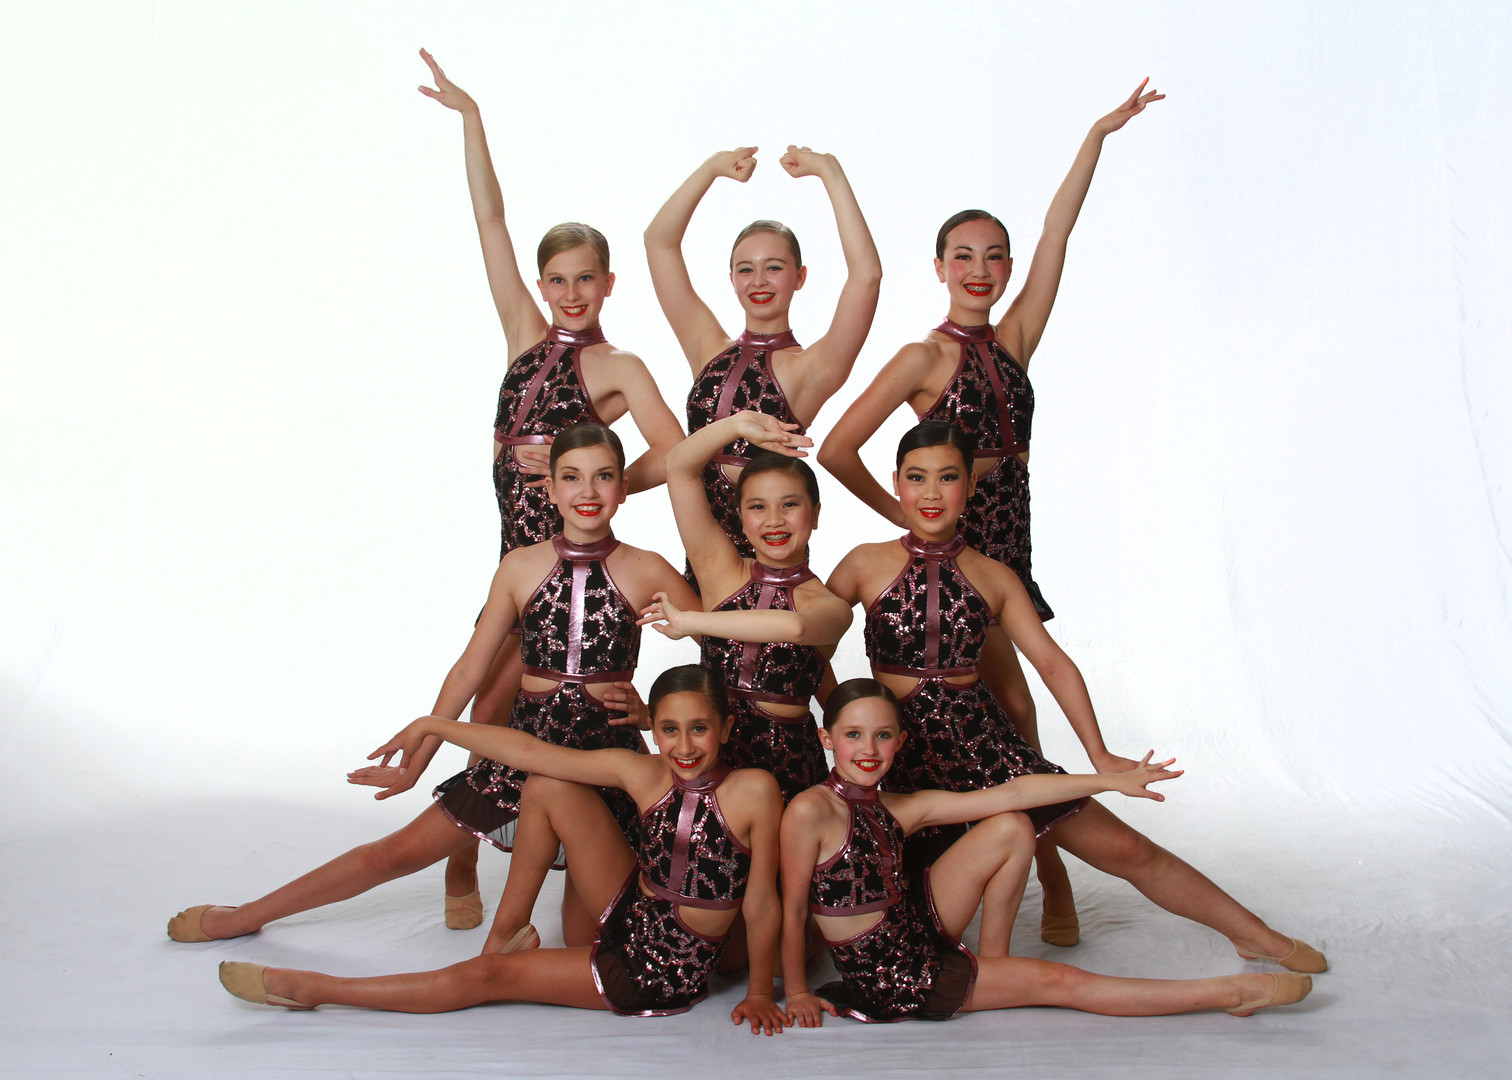 Bailar~KarinaFl_KaileyKw_KendallLa_MariLa_IsabelDa_AlexandraSh_ShelbyTo_EliseGe_0437.jpg